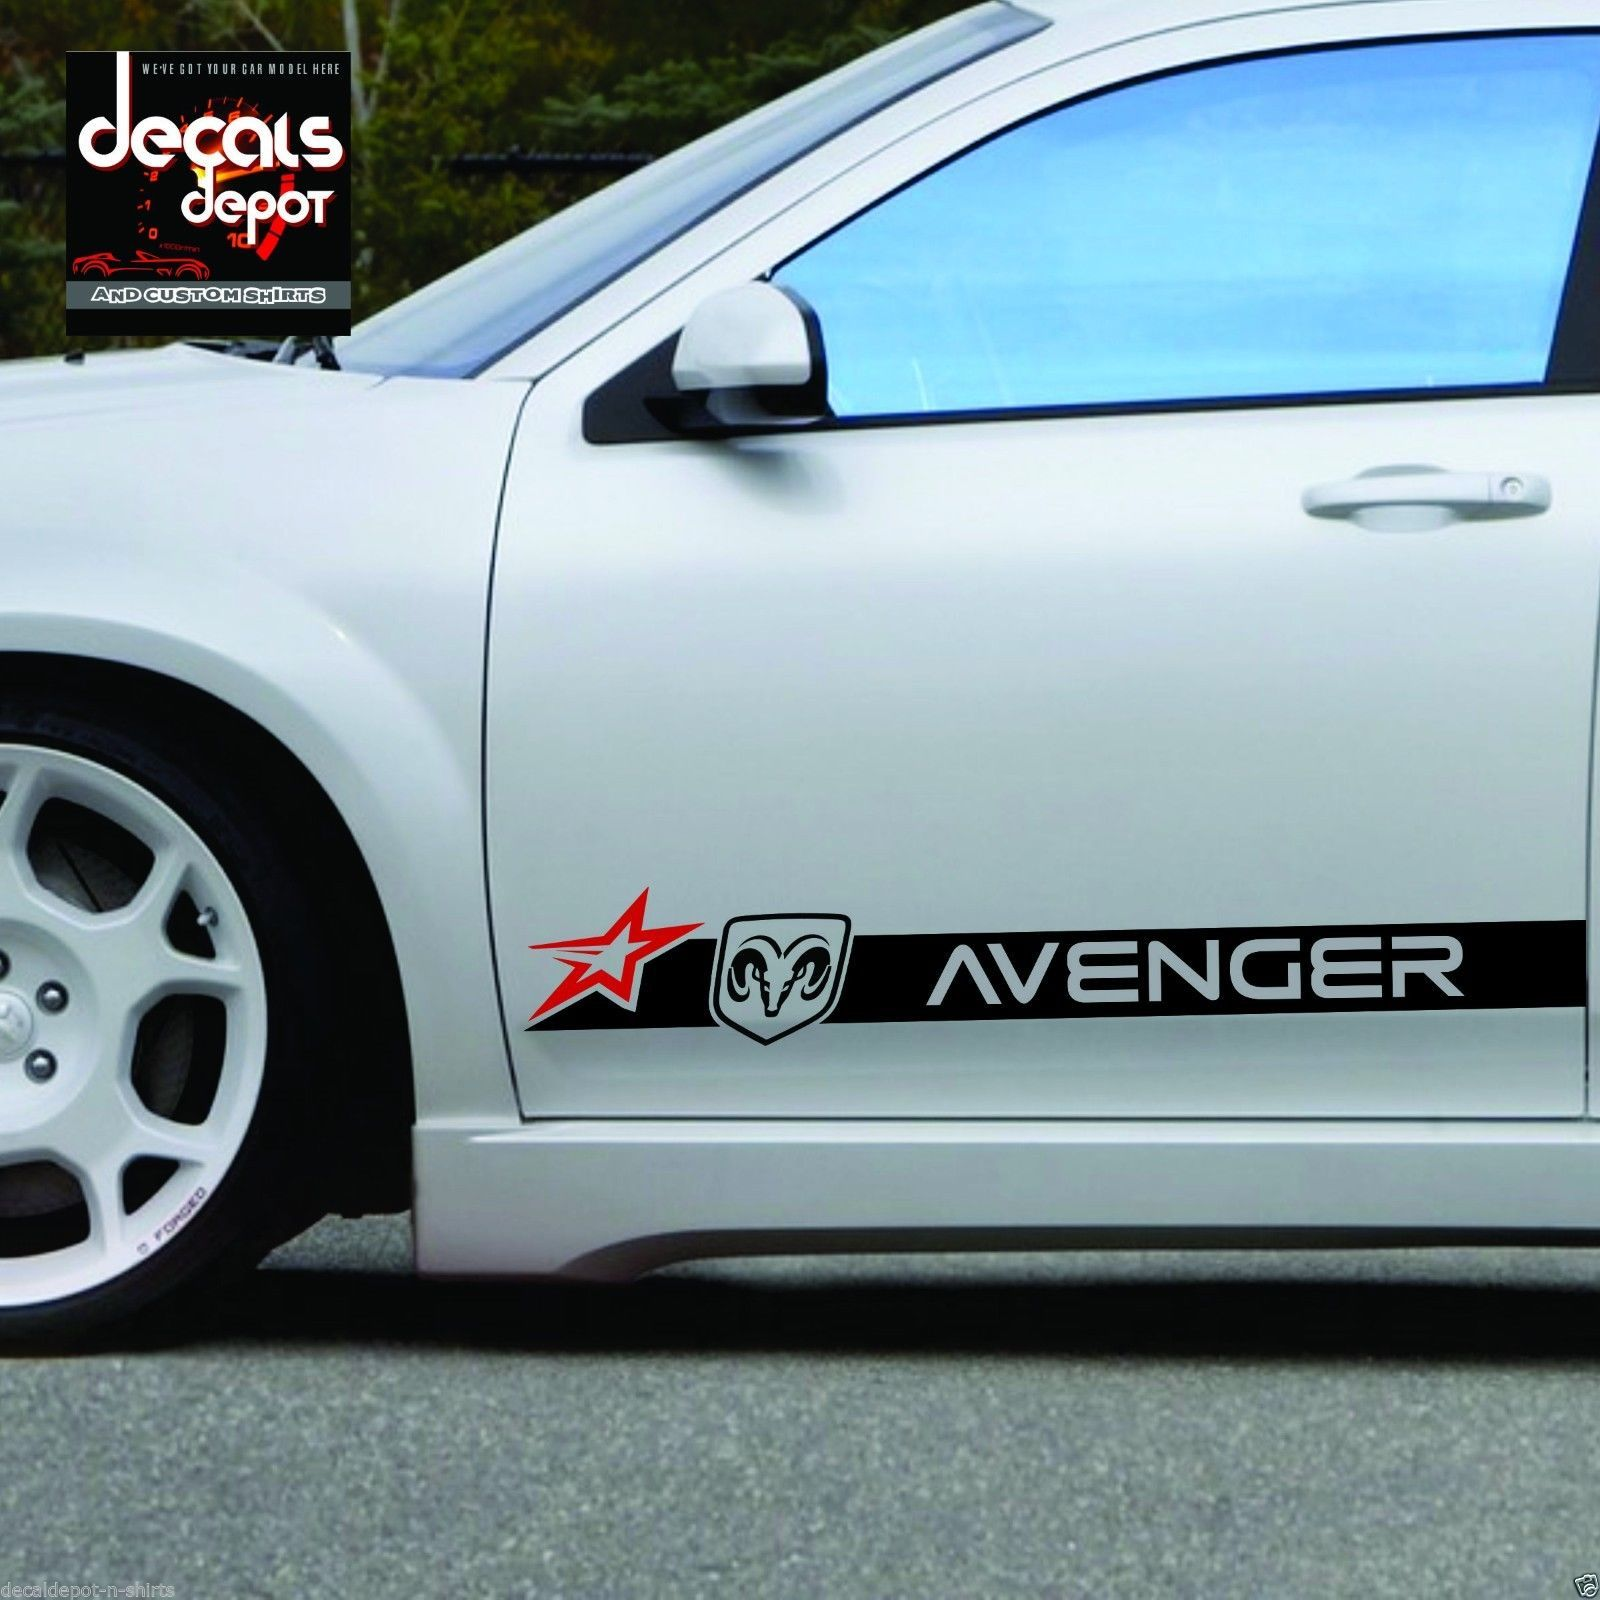 Decal Vinyl Sticker Fits Dodge Avenger 2009 To 2019 Rocker Panel Stripes Ebay Dodge Avenger Dodge Avengers [ 1600 x 1600 Pixel ]